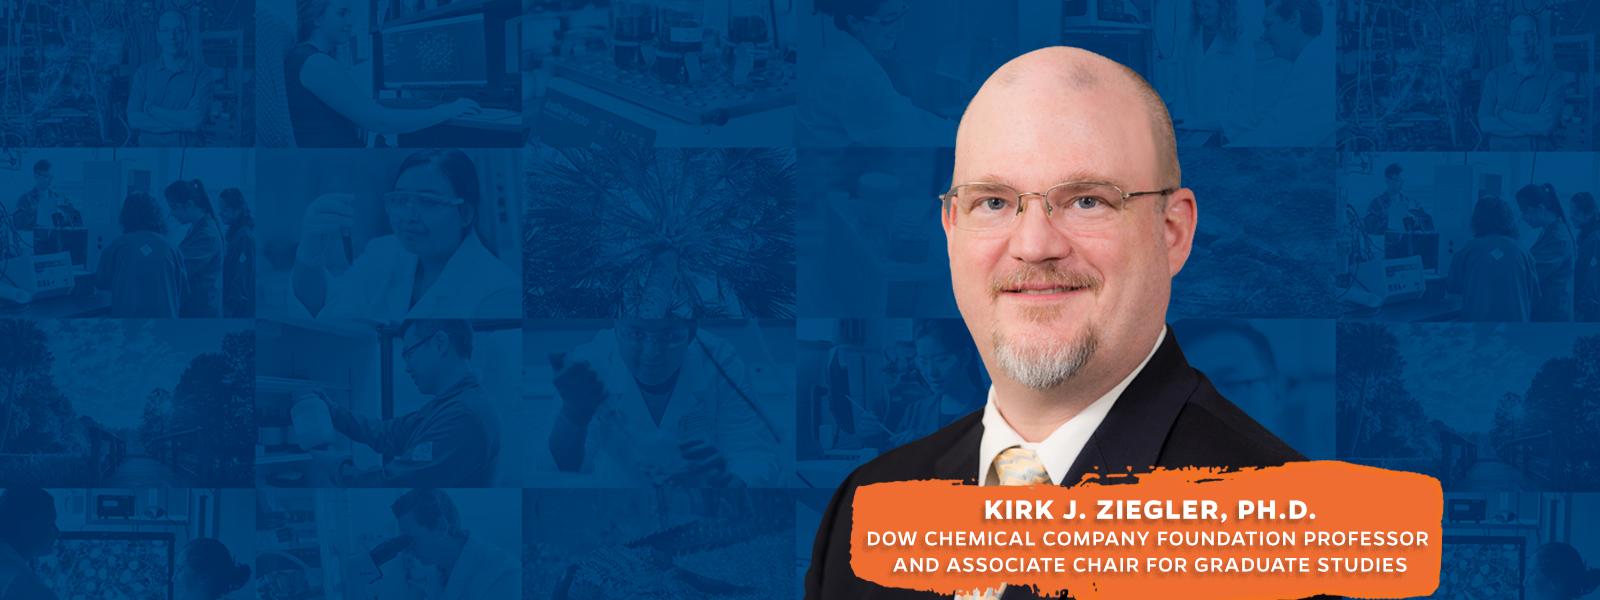 Kirk J. Ziegler, Ph.D.